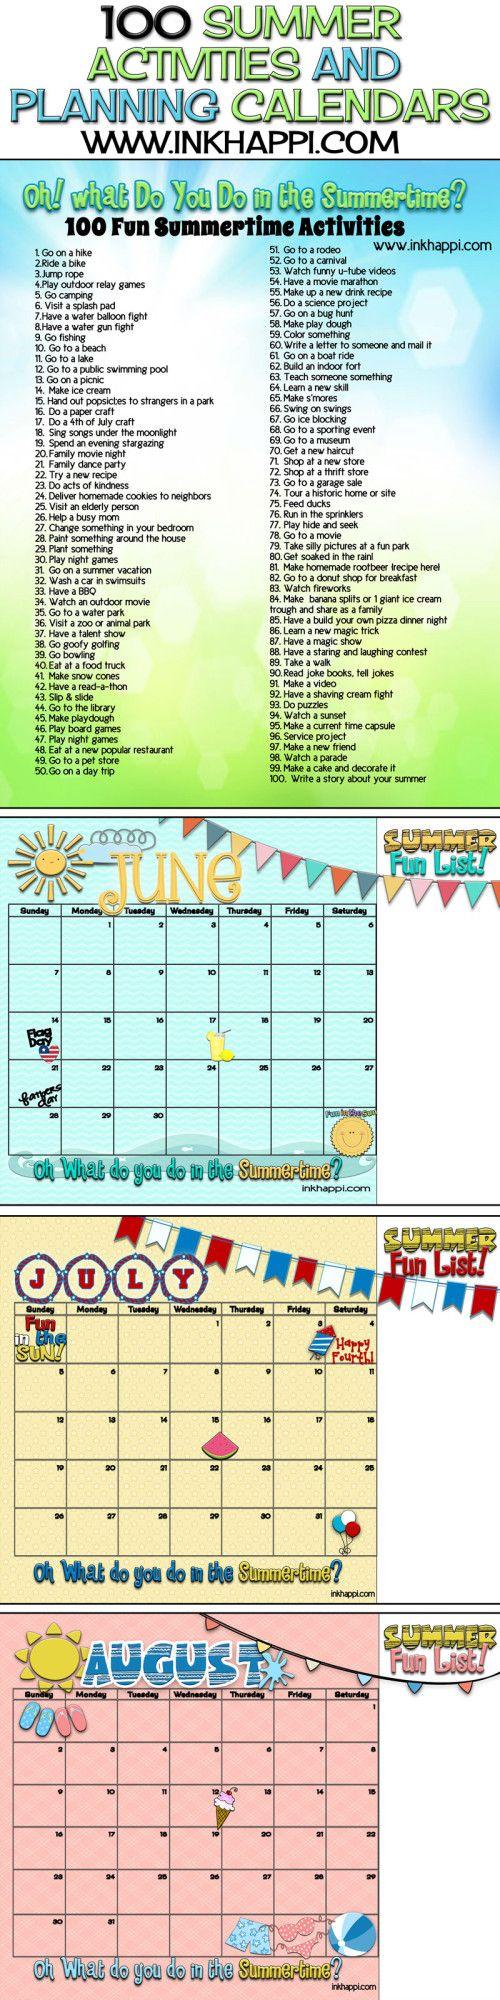 467 best Summer Camp images on Pinterest | Classroom ideas ...